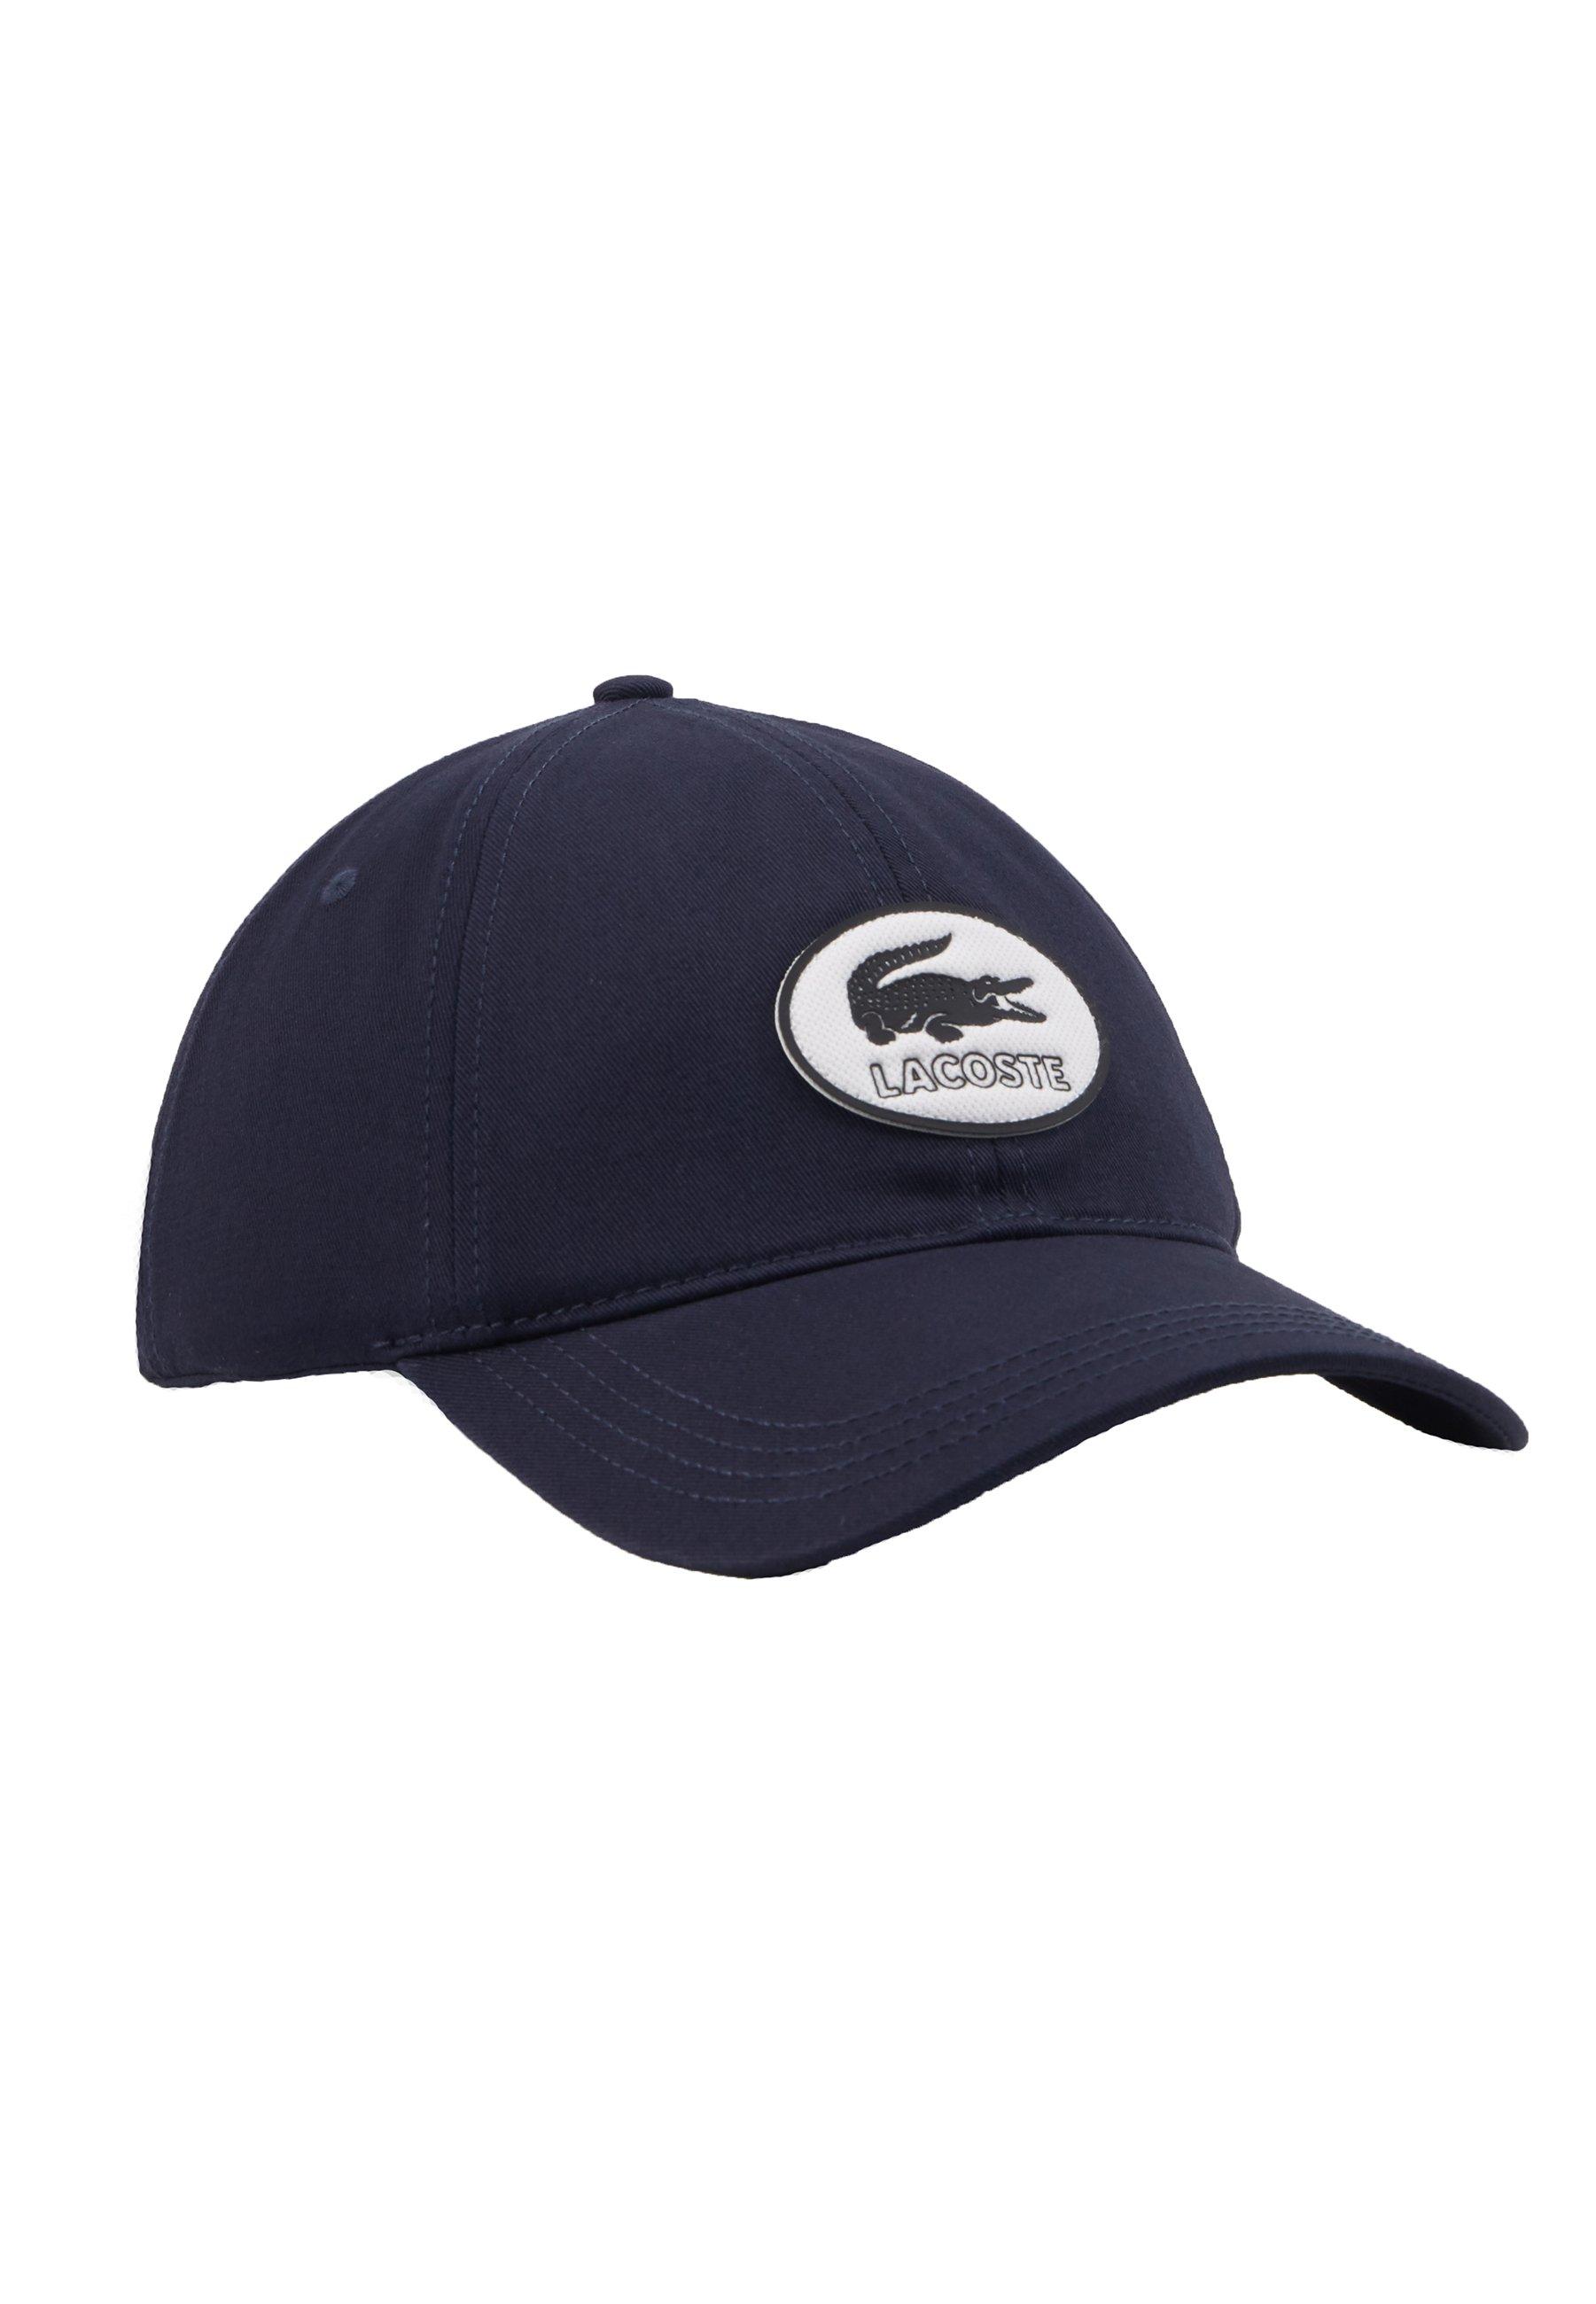 Lacoste Keps - dark navy blue